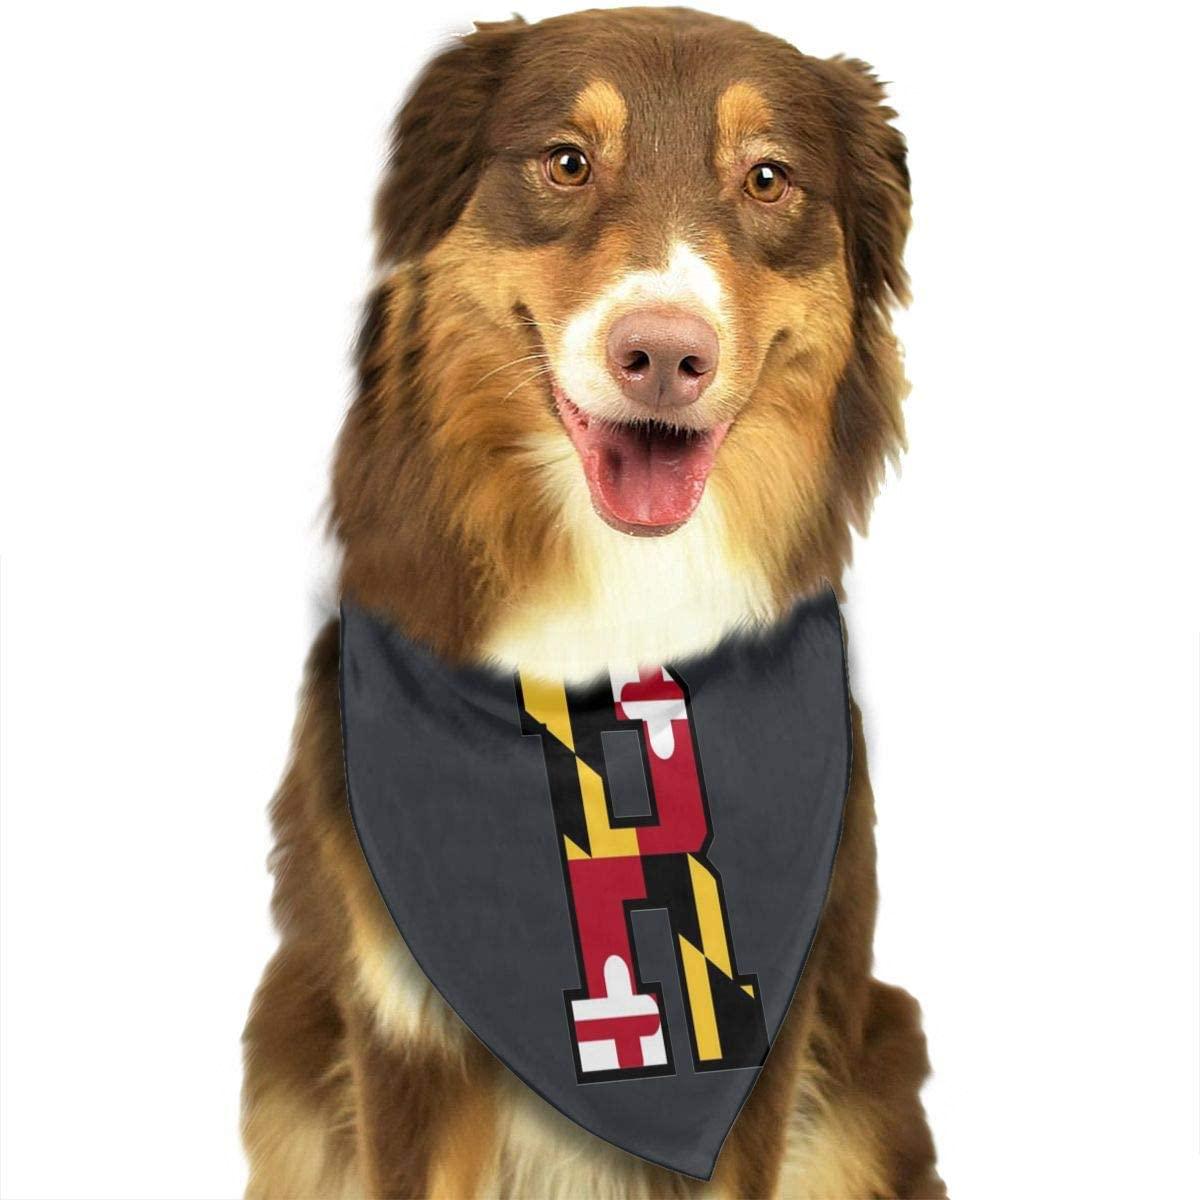 CHAN03 Dogs Bandana Collars Maryland Flag R Pets Triangle Neckerchief Puppy Bibs Scarfs Cats Scarfs Towel